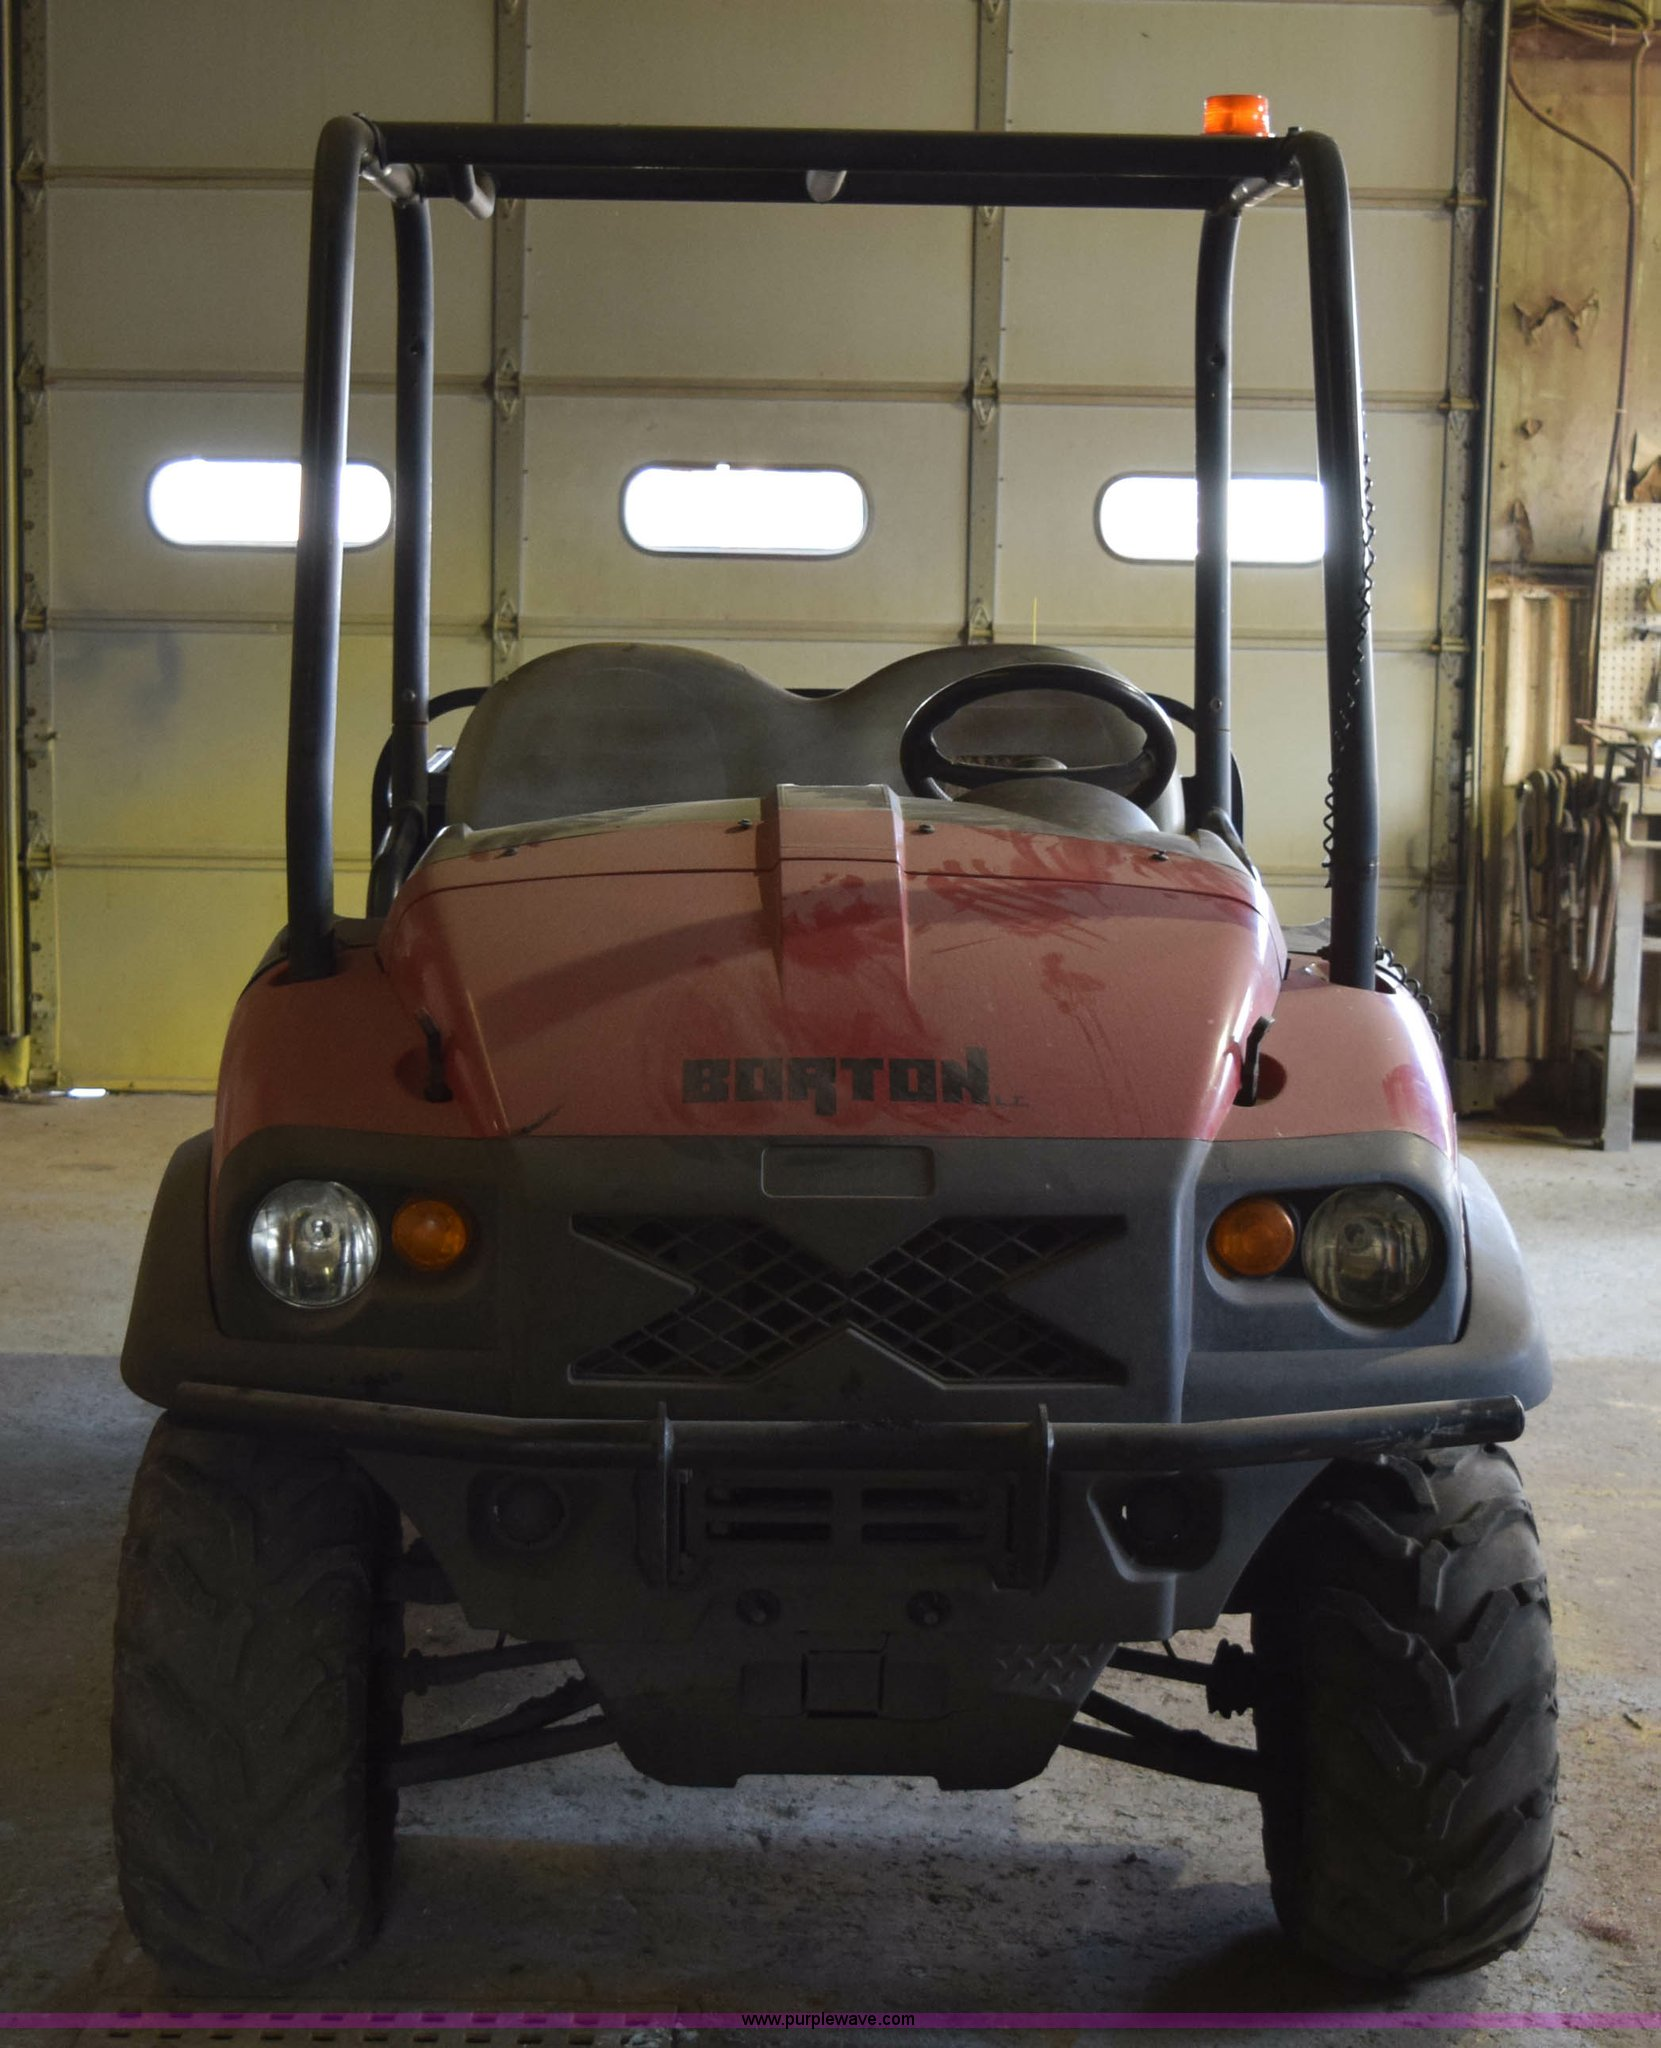 ... 2007 Club Car XRT 1550 utility vehicle Full size in new window ...